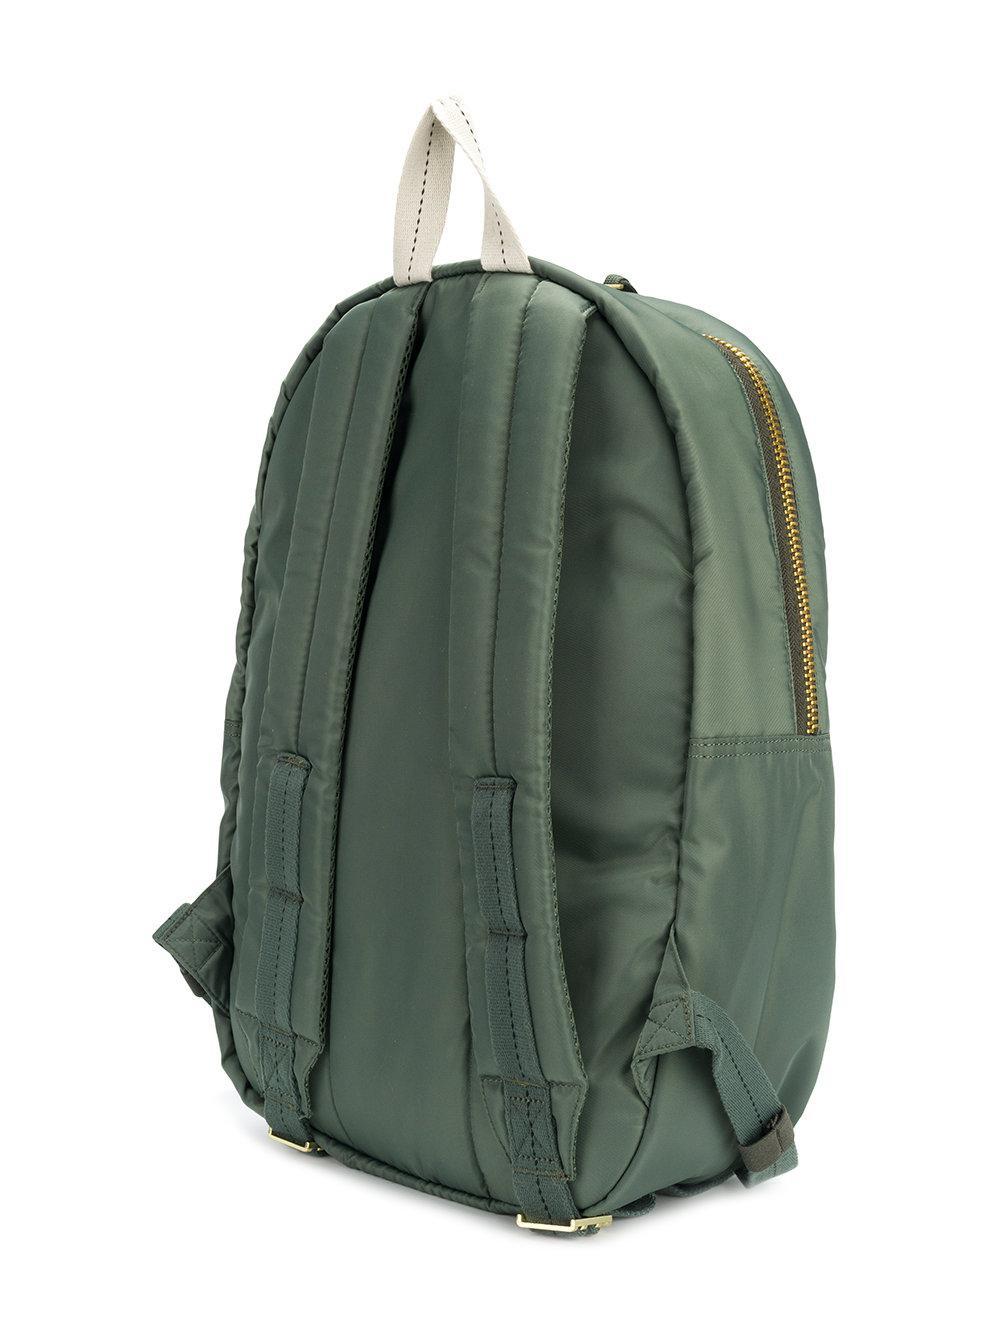 Lyst - Herschel Supply Co. Logo Patch Backpack in Green for Men 65866192d0